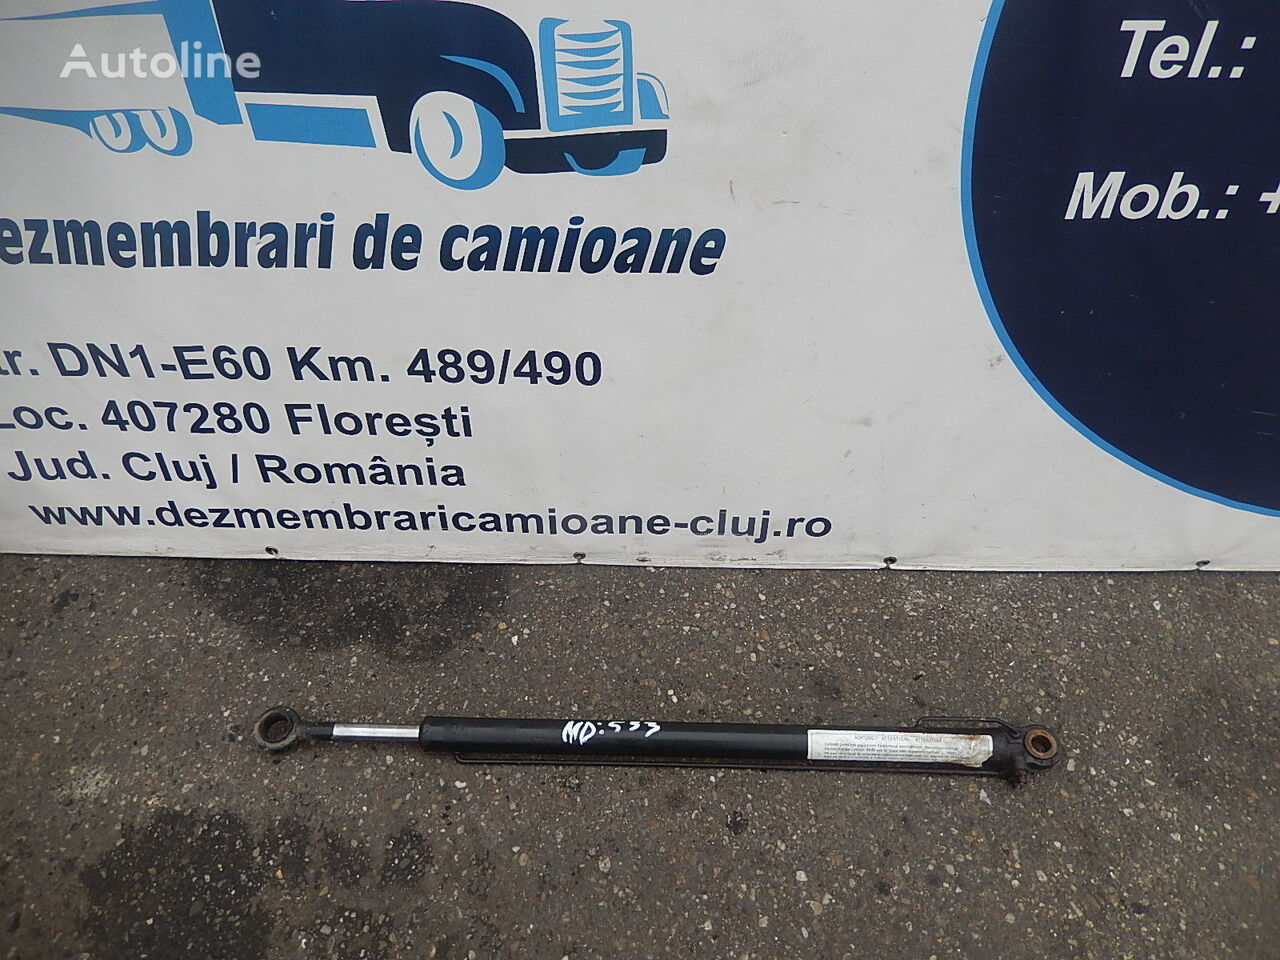 MAN Cilindru rabatare cabina Tgx 2008 / M112/533 / 819781222 pumpe løfte førerhuset for MAN TGX trekkvogn